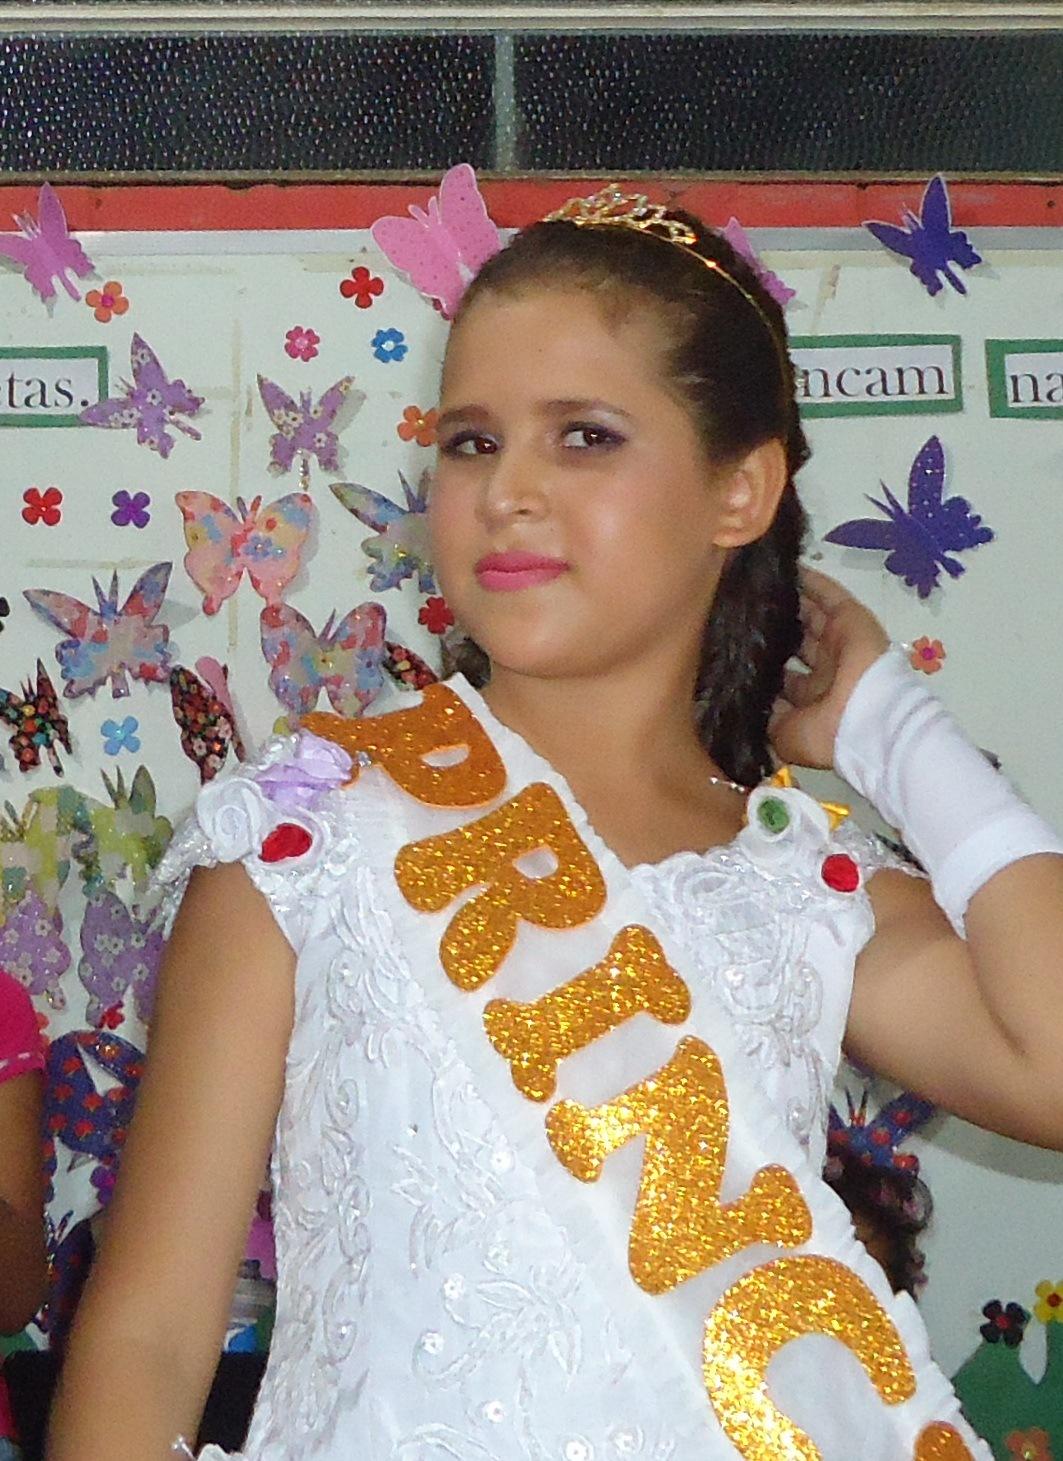 FESTA DAS FLORES 2015